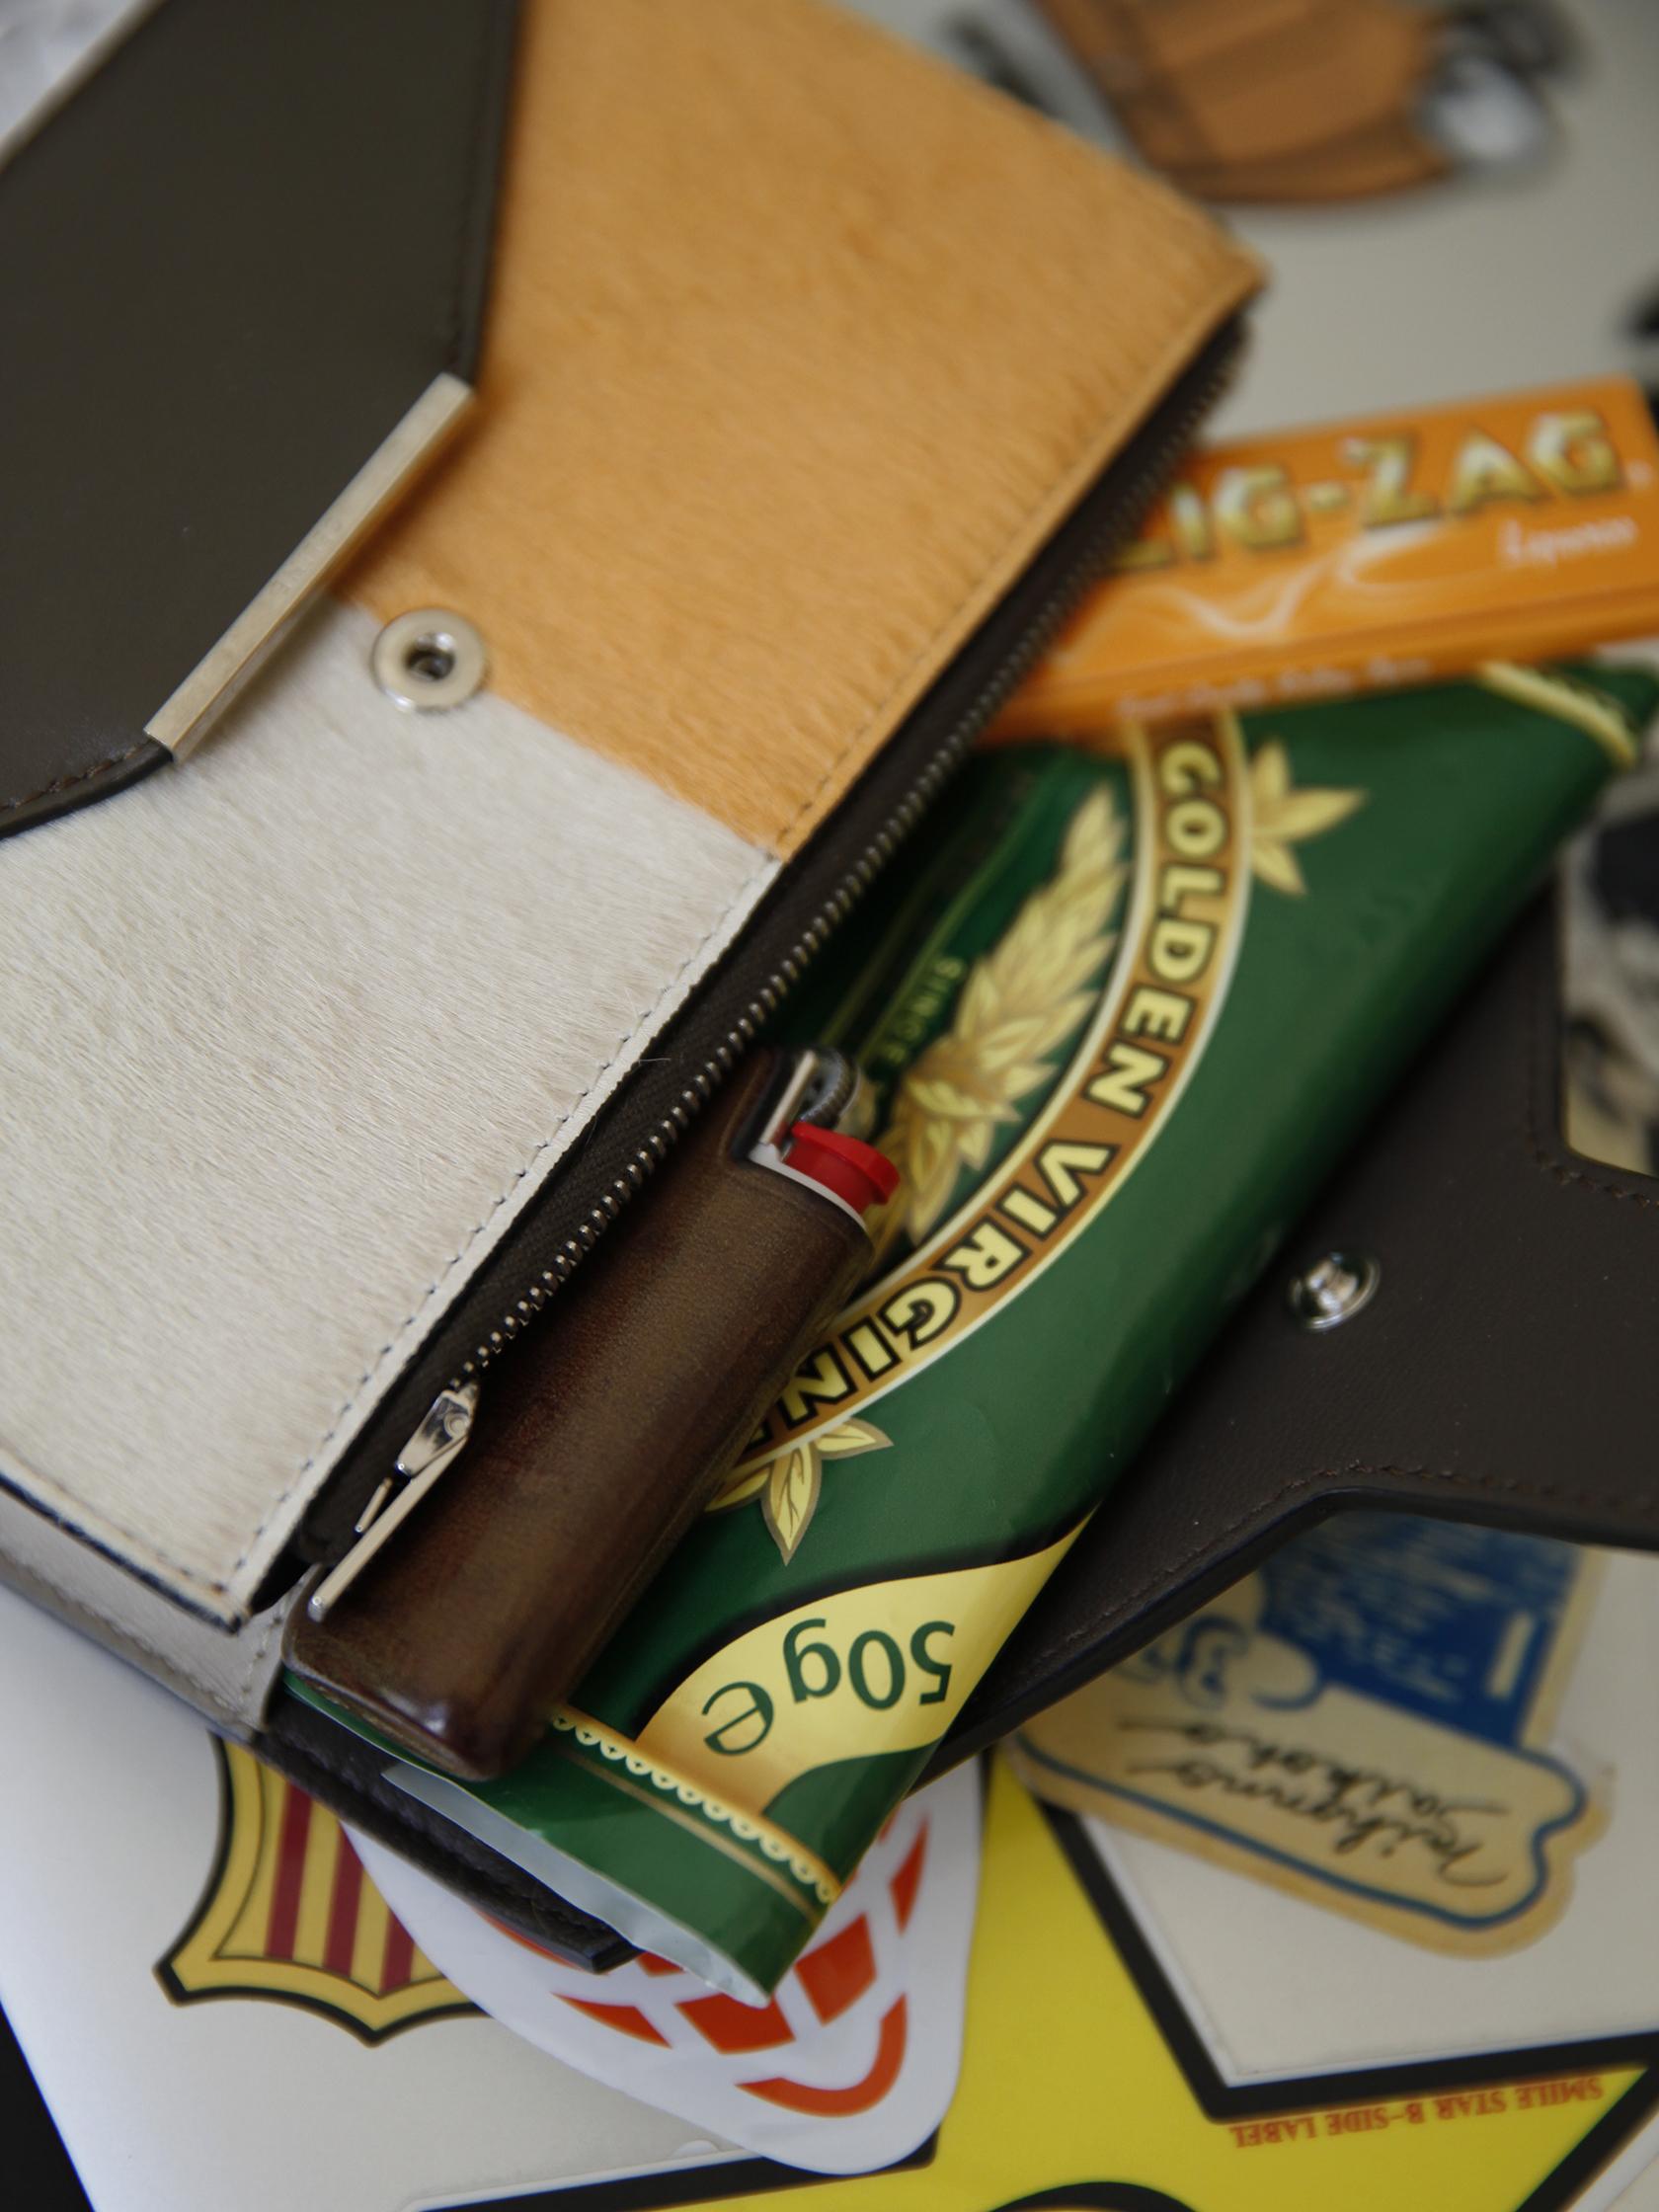 celine credit card pouch 1